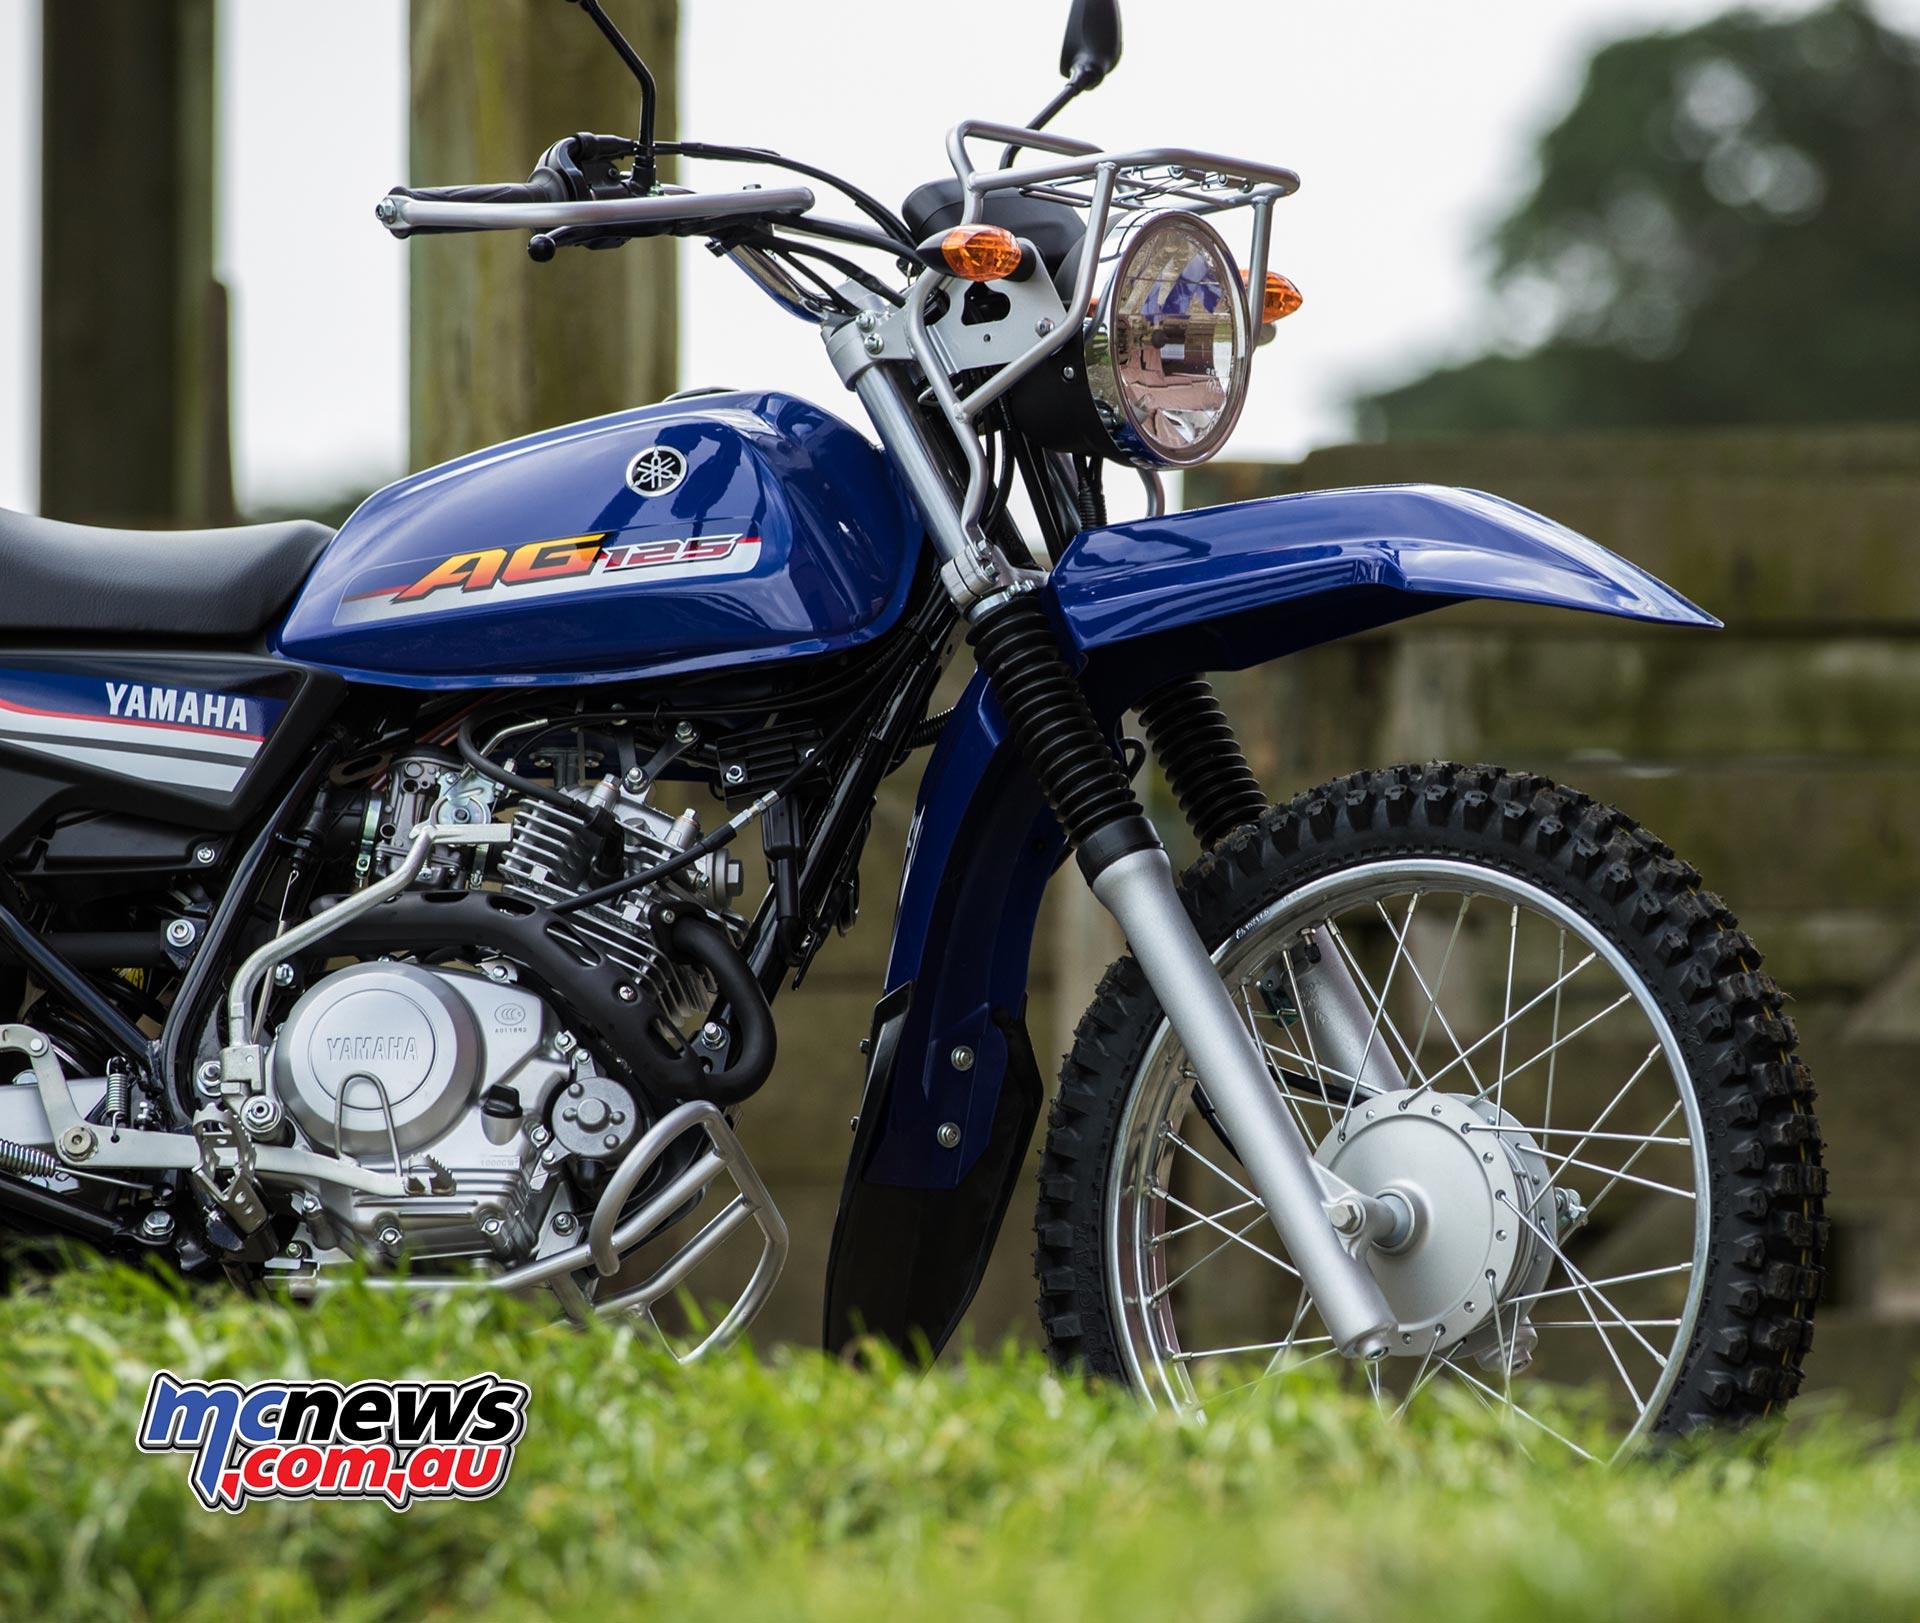 yamaha ag legend back better than ever 3499 mcnews com au rh mcnews com au New Yamaha Xmax Scooters Motorcycles Yamaha Motorcycle Parts